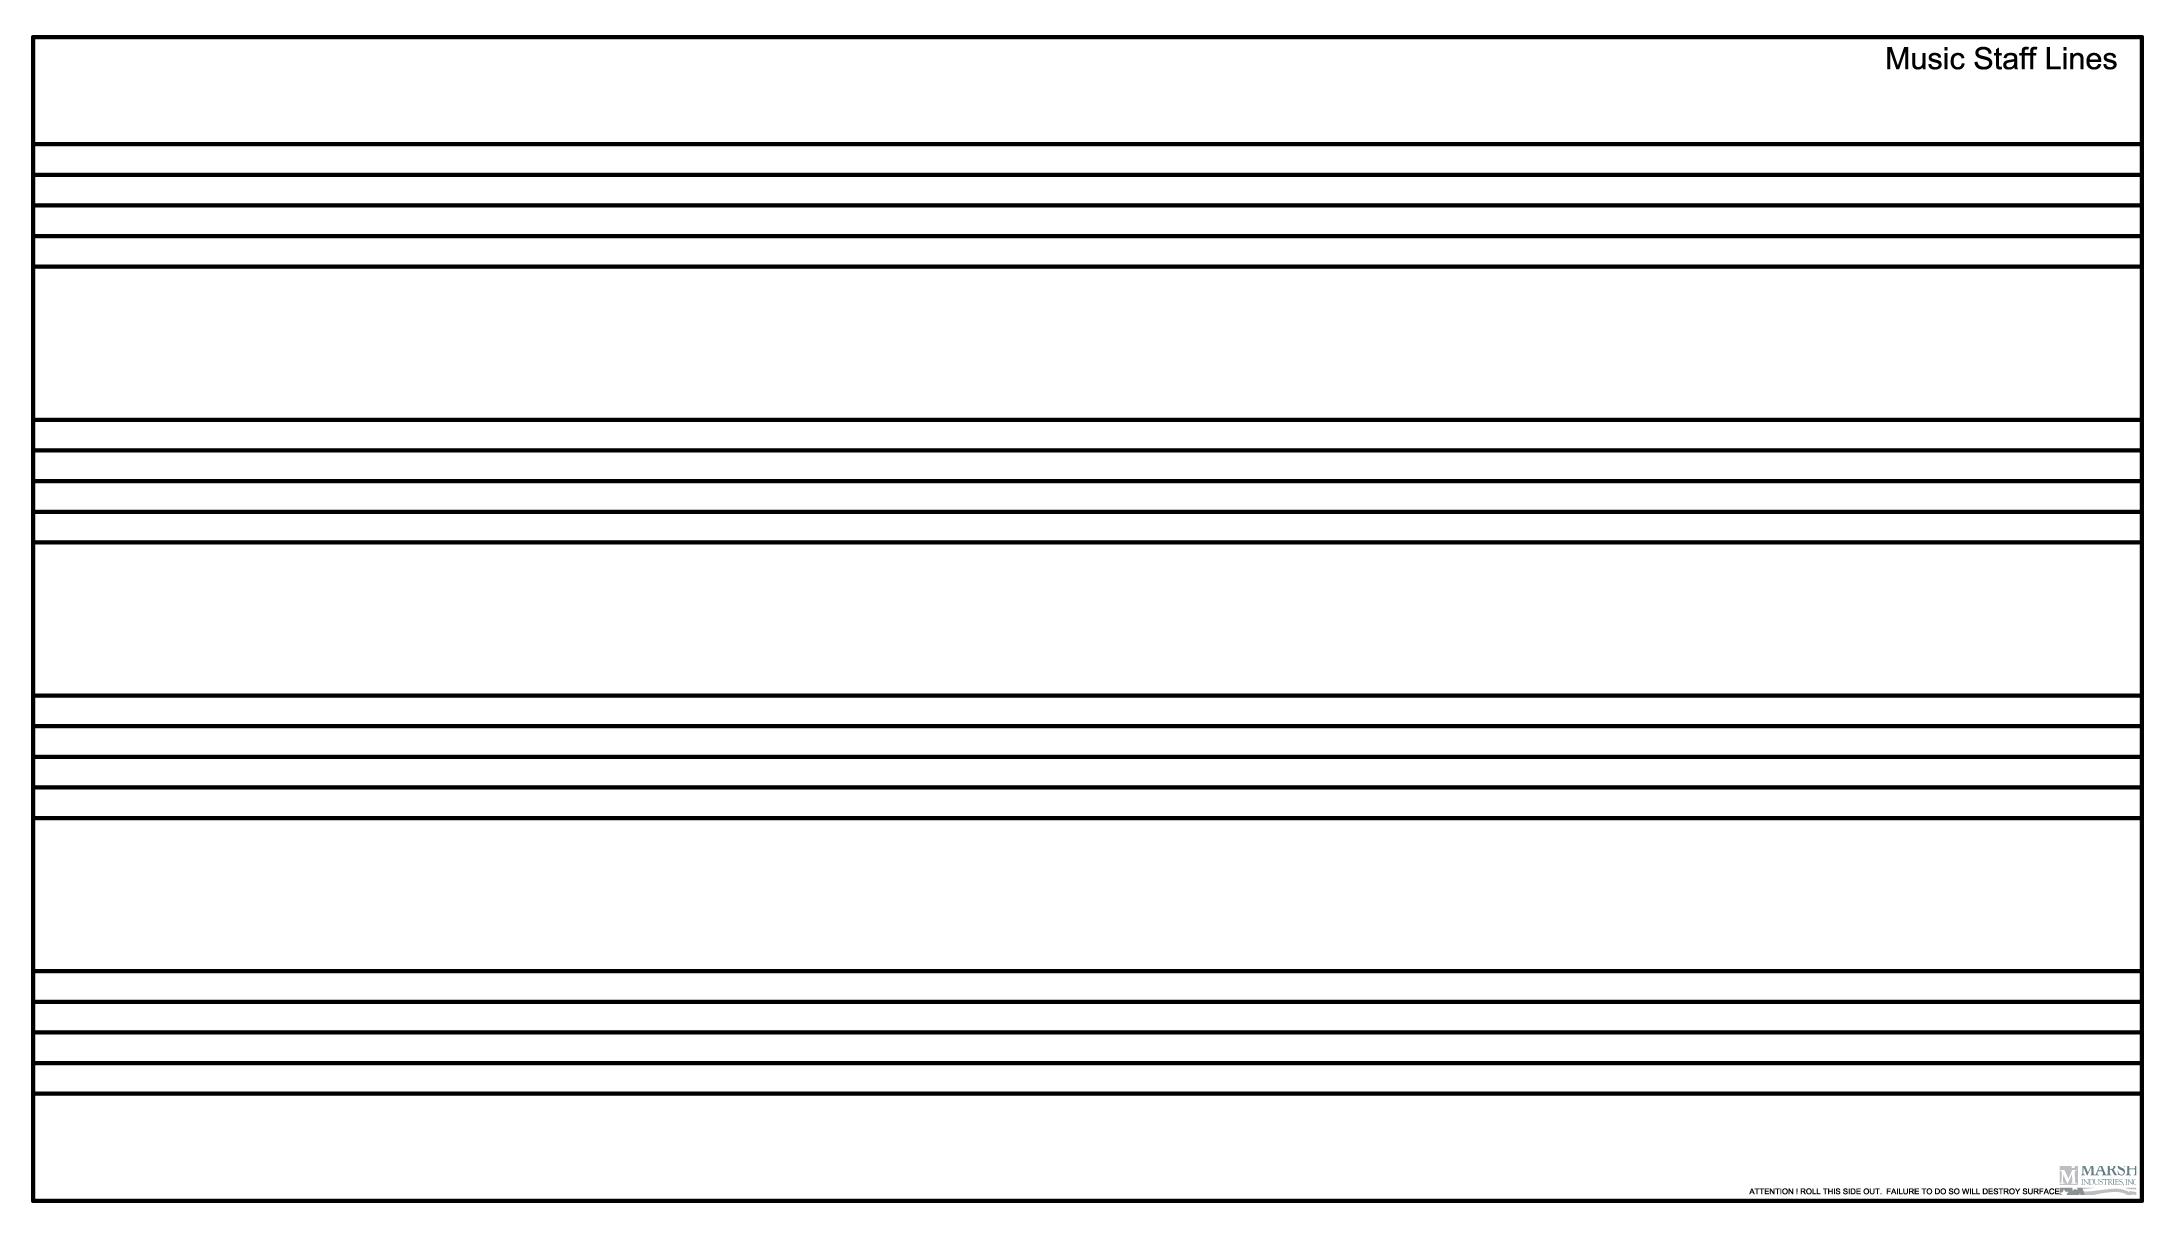 music staff lines.jpg